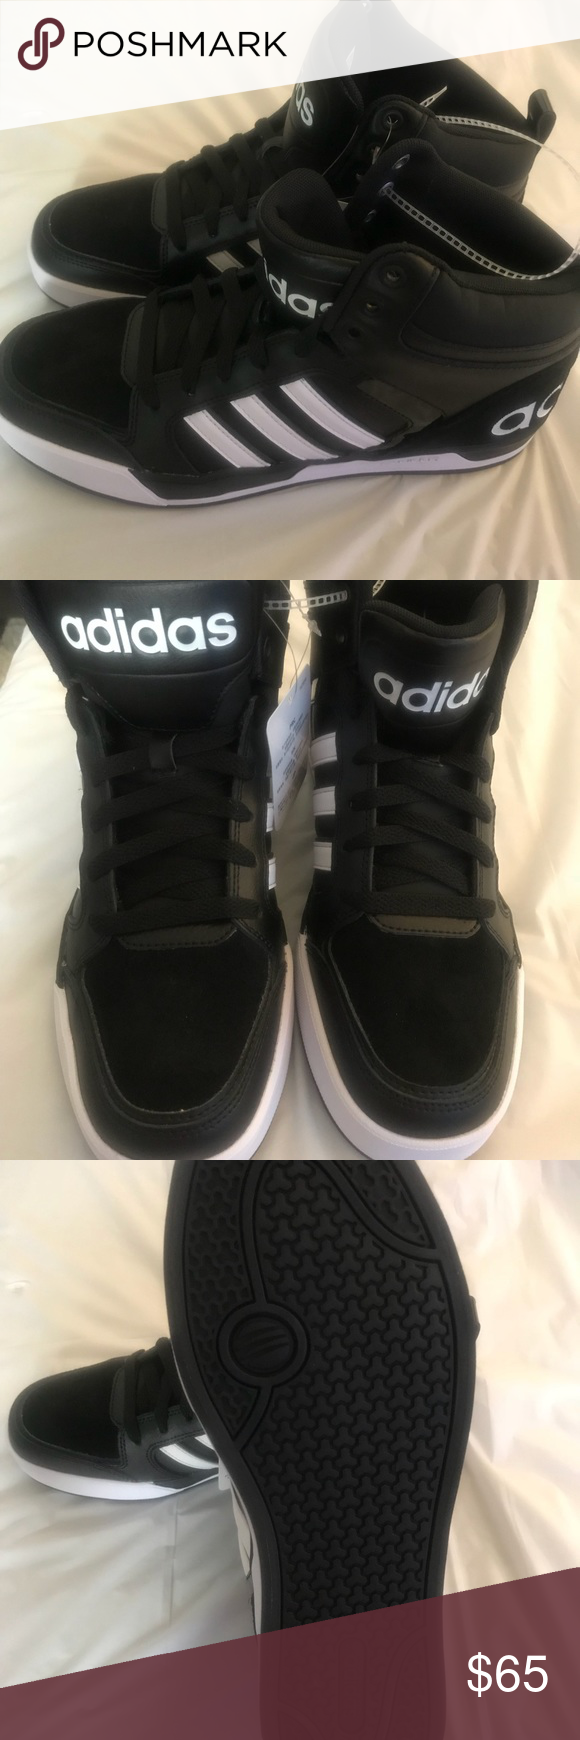 adidas neo - raleigh bianco nero aw5407 uomini dimensioni 9